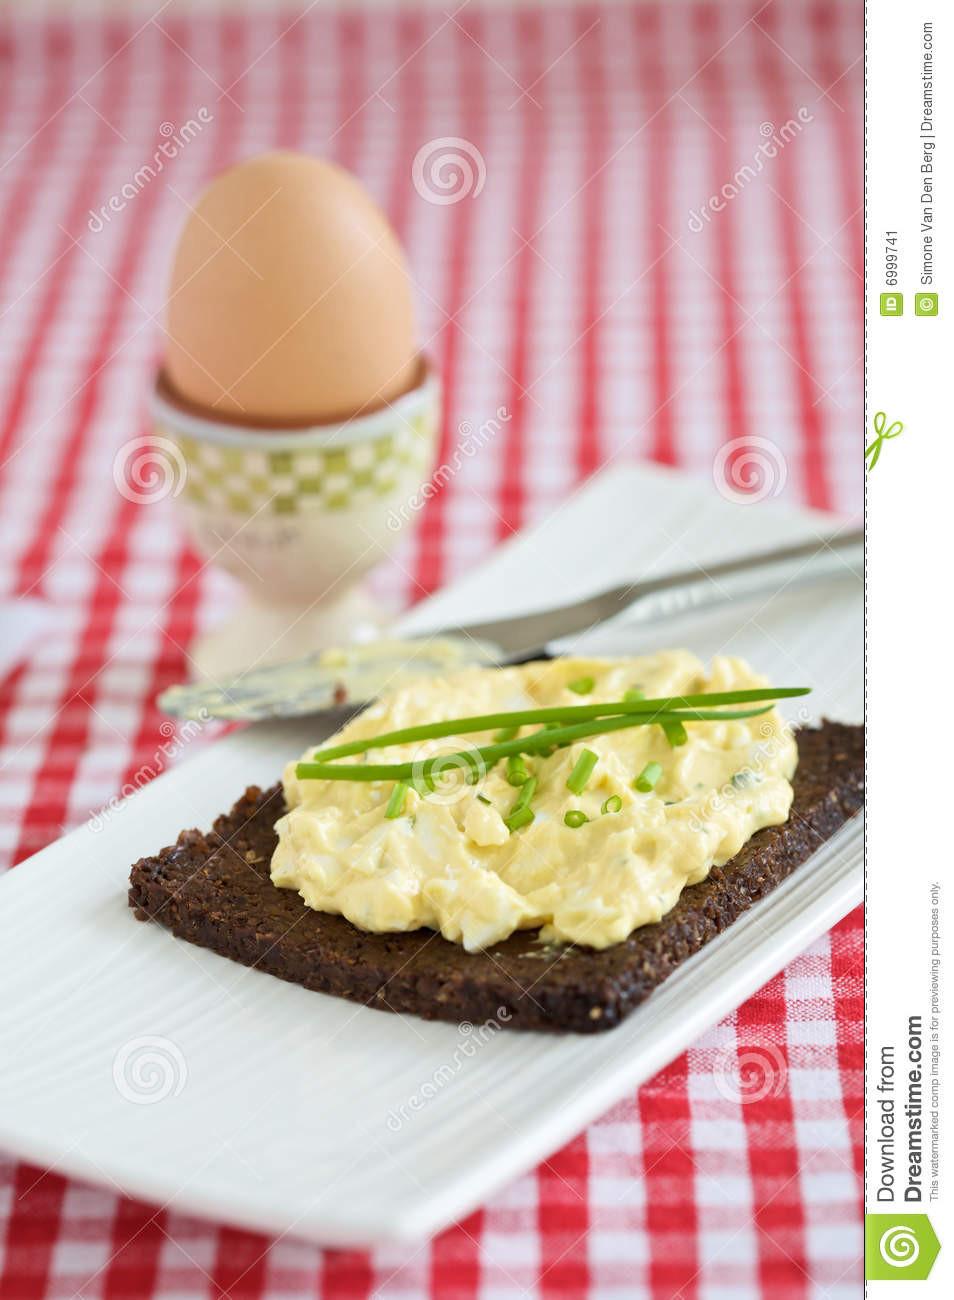 Healthy Light Breakfast  Healthy And Light Breakfast Stock Image Image